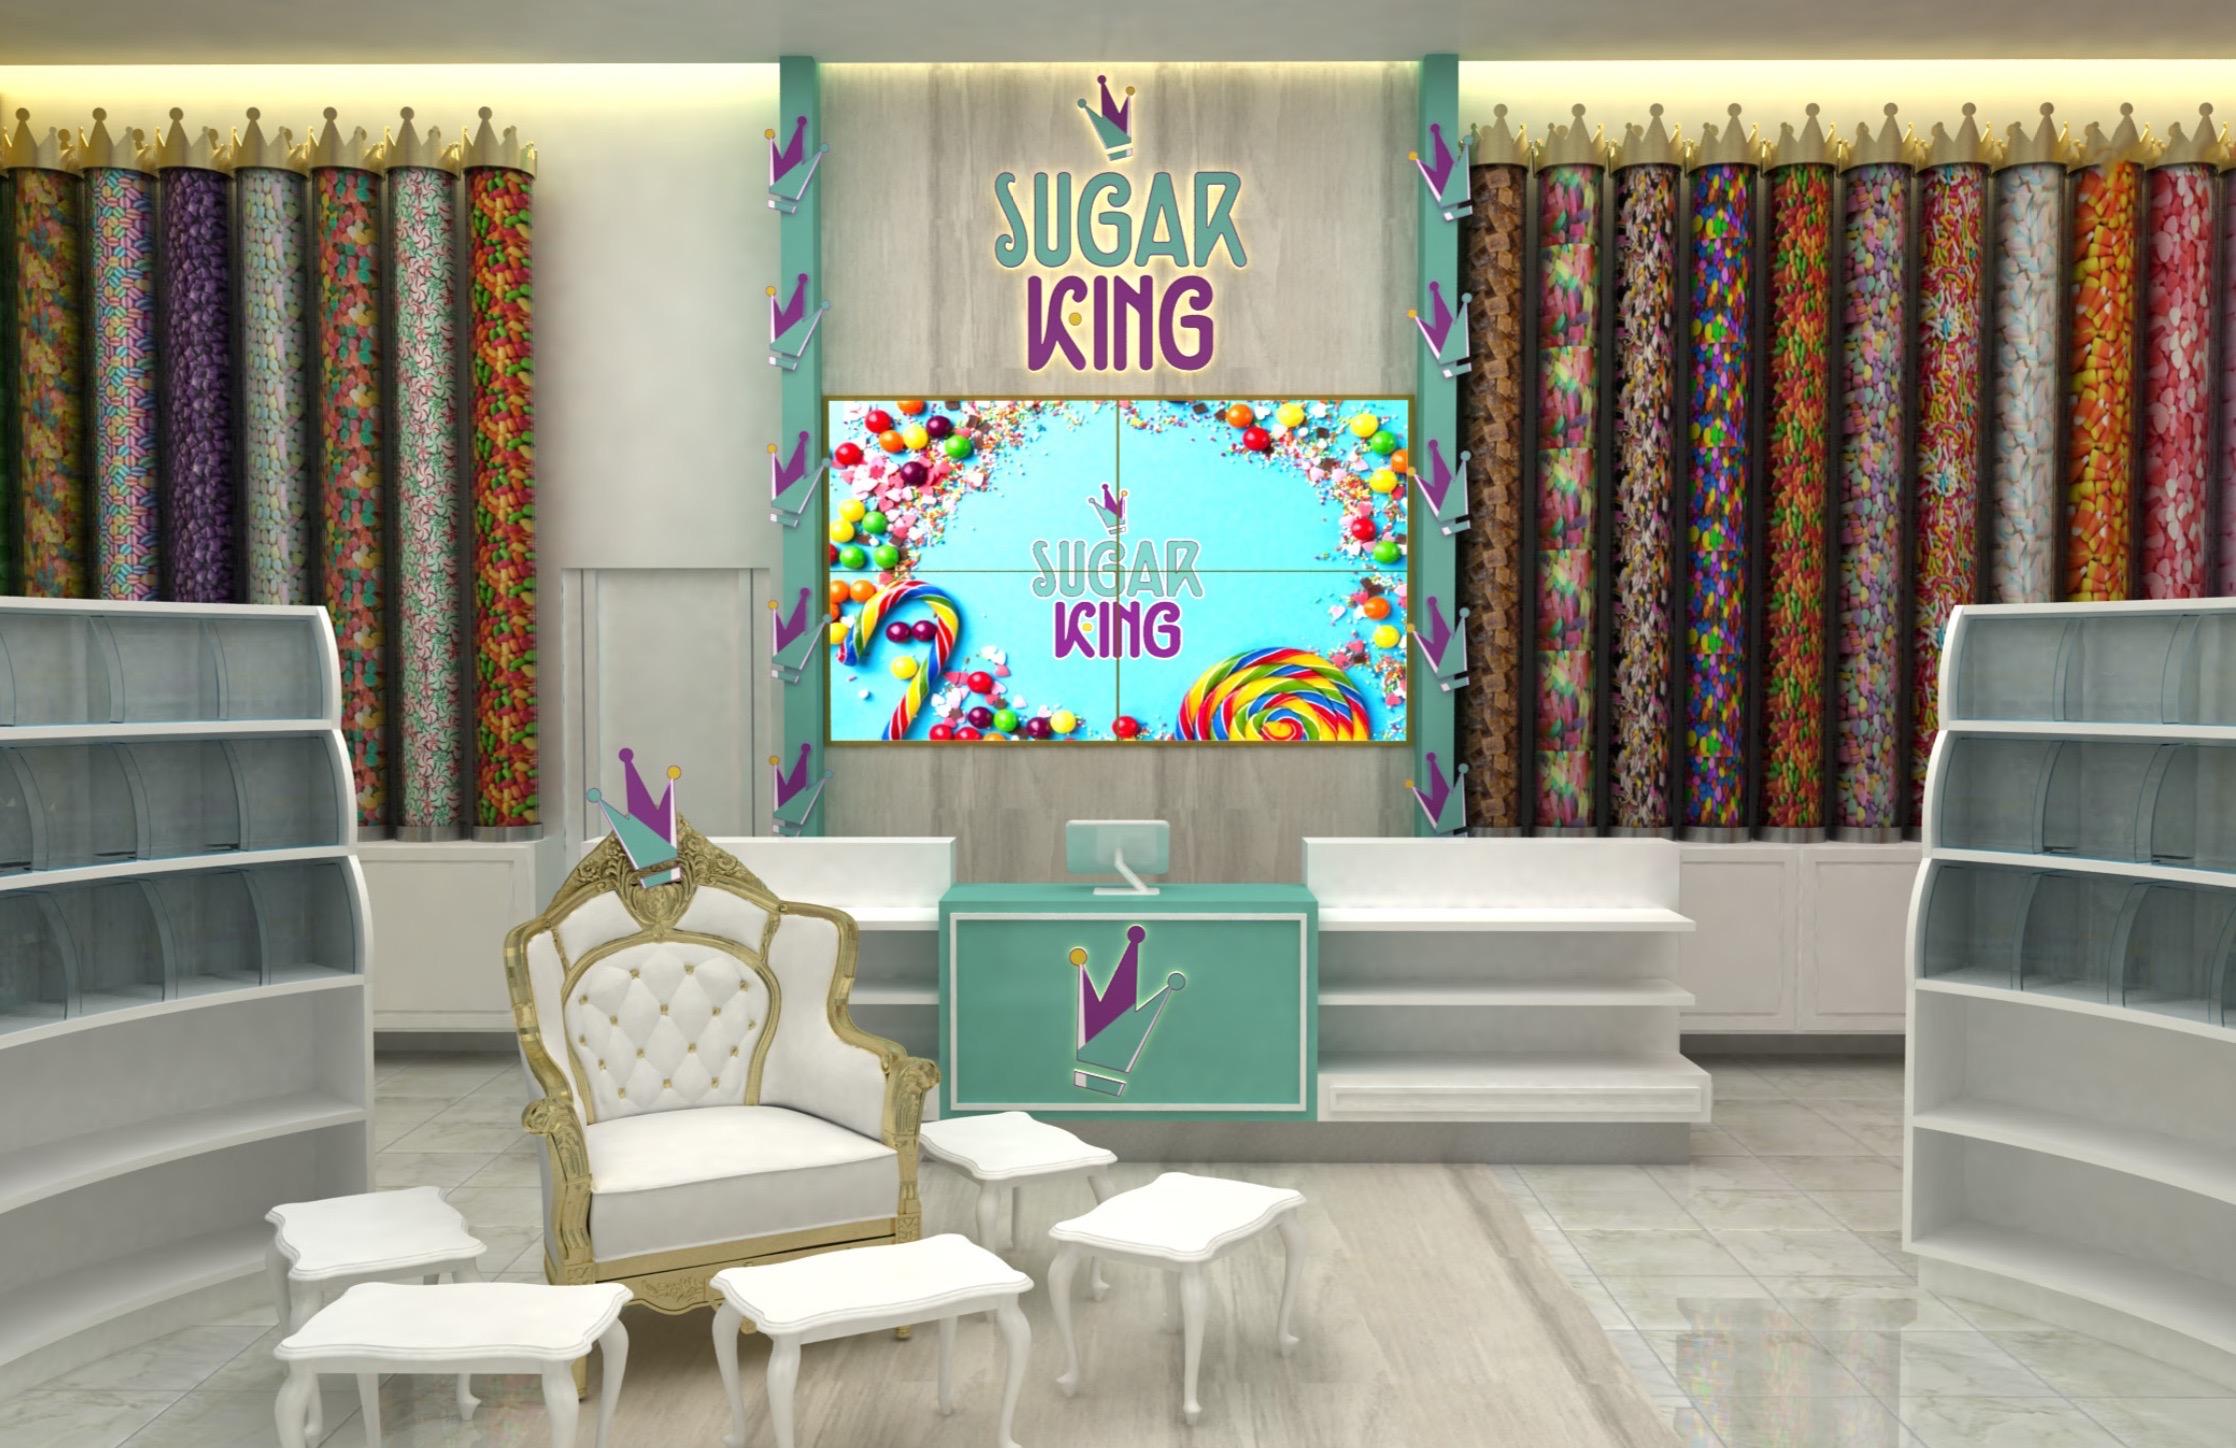 Sugar King Store